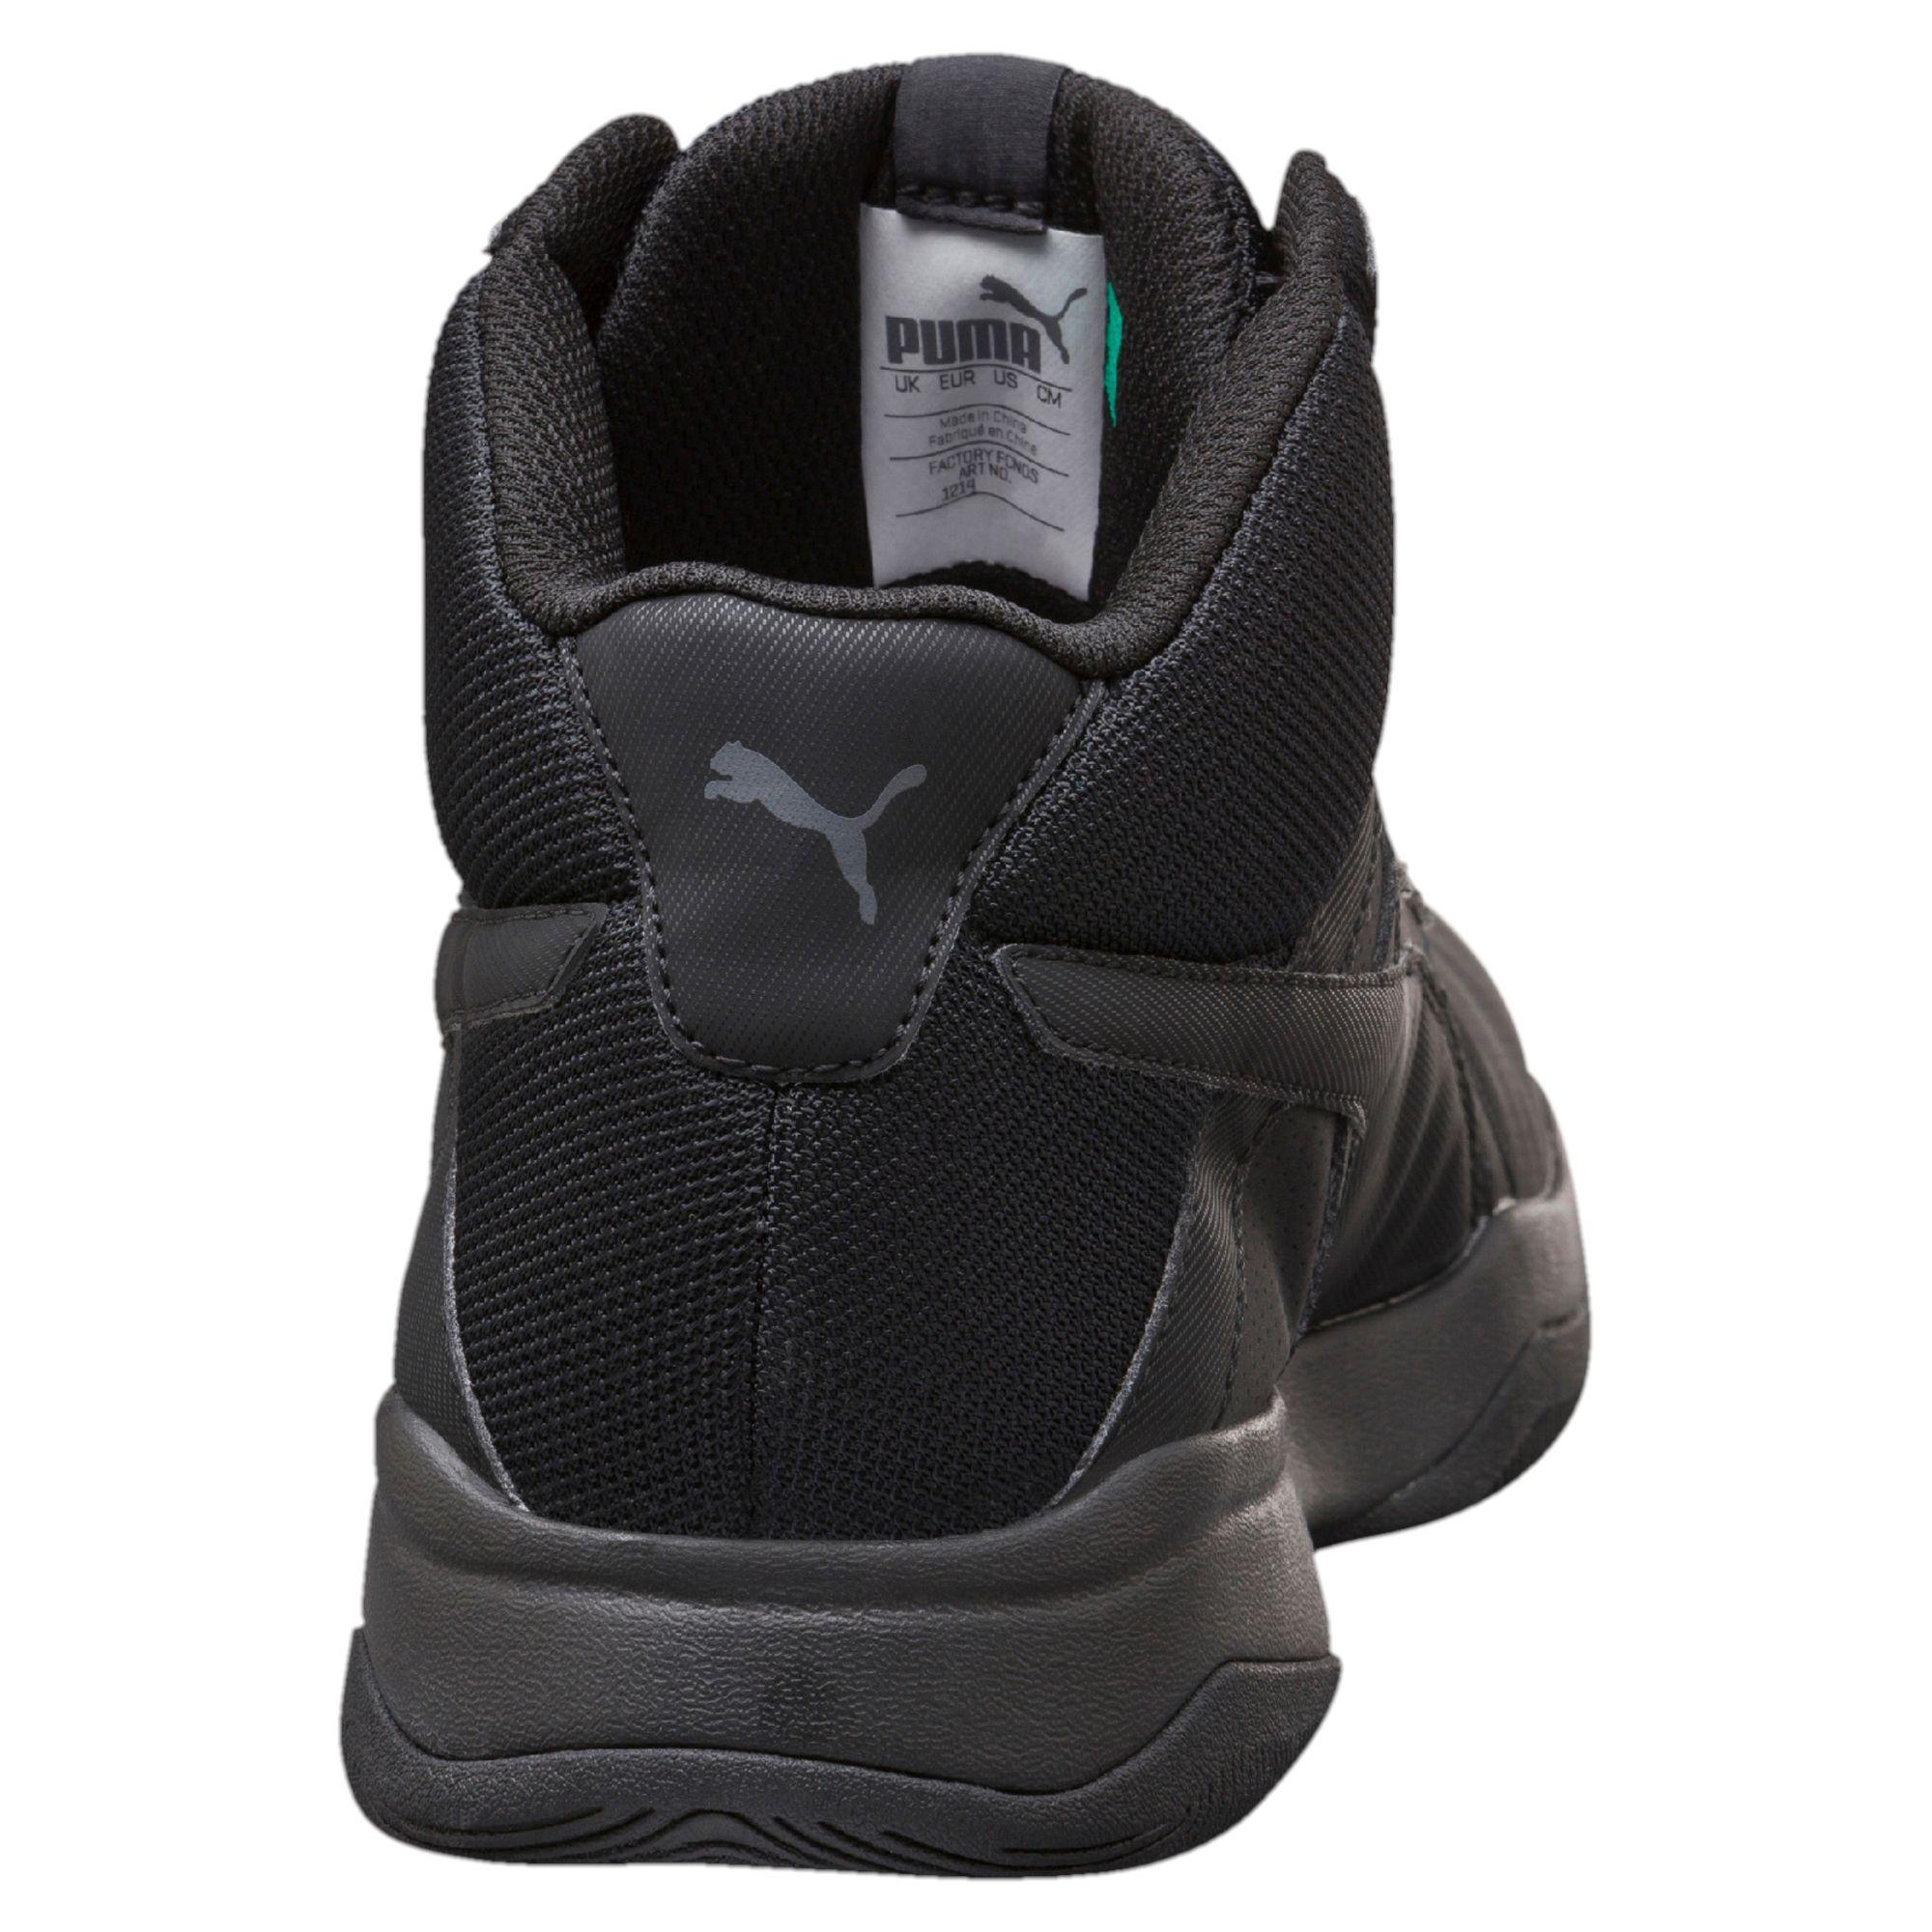 2ab525b7305 Details about PUMA Rebound Street Evo SL High Tops Basics Mid Boot Unisex  New